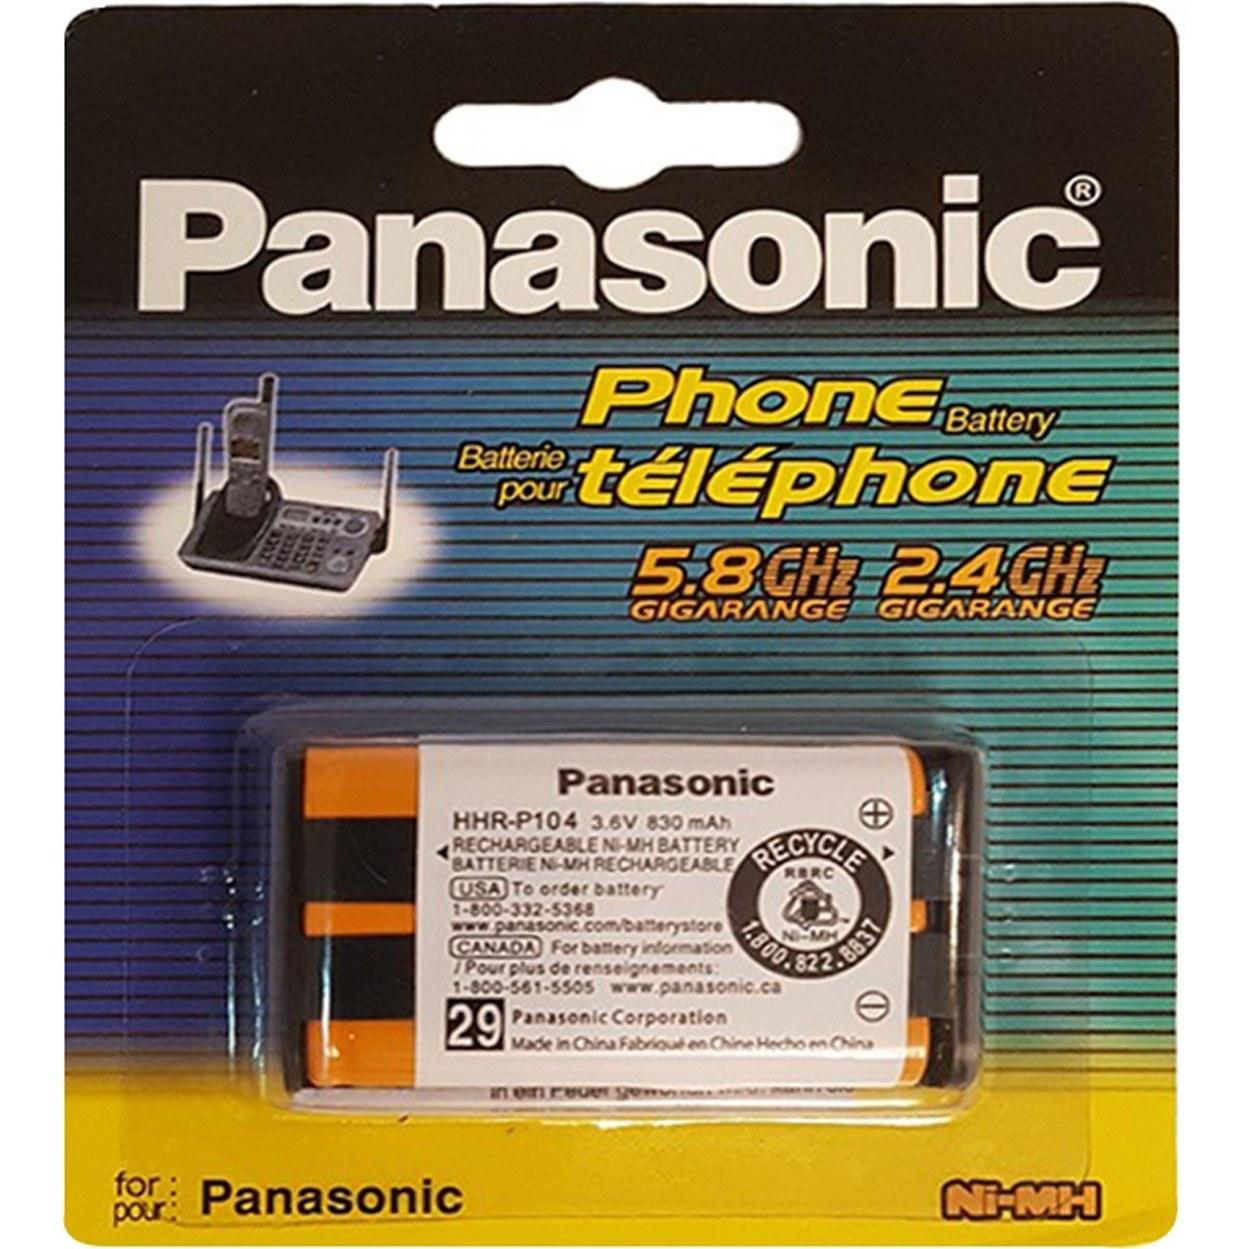 تصویر باتری تلفن بی سیم قابل شارژ پاناسونیک مدل HHR-P104 Panasonic HHR-P104 Cordless Phone Rechargeable Battery